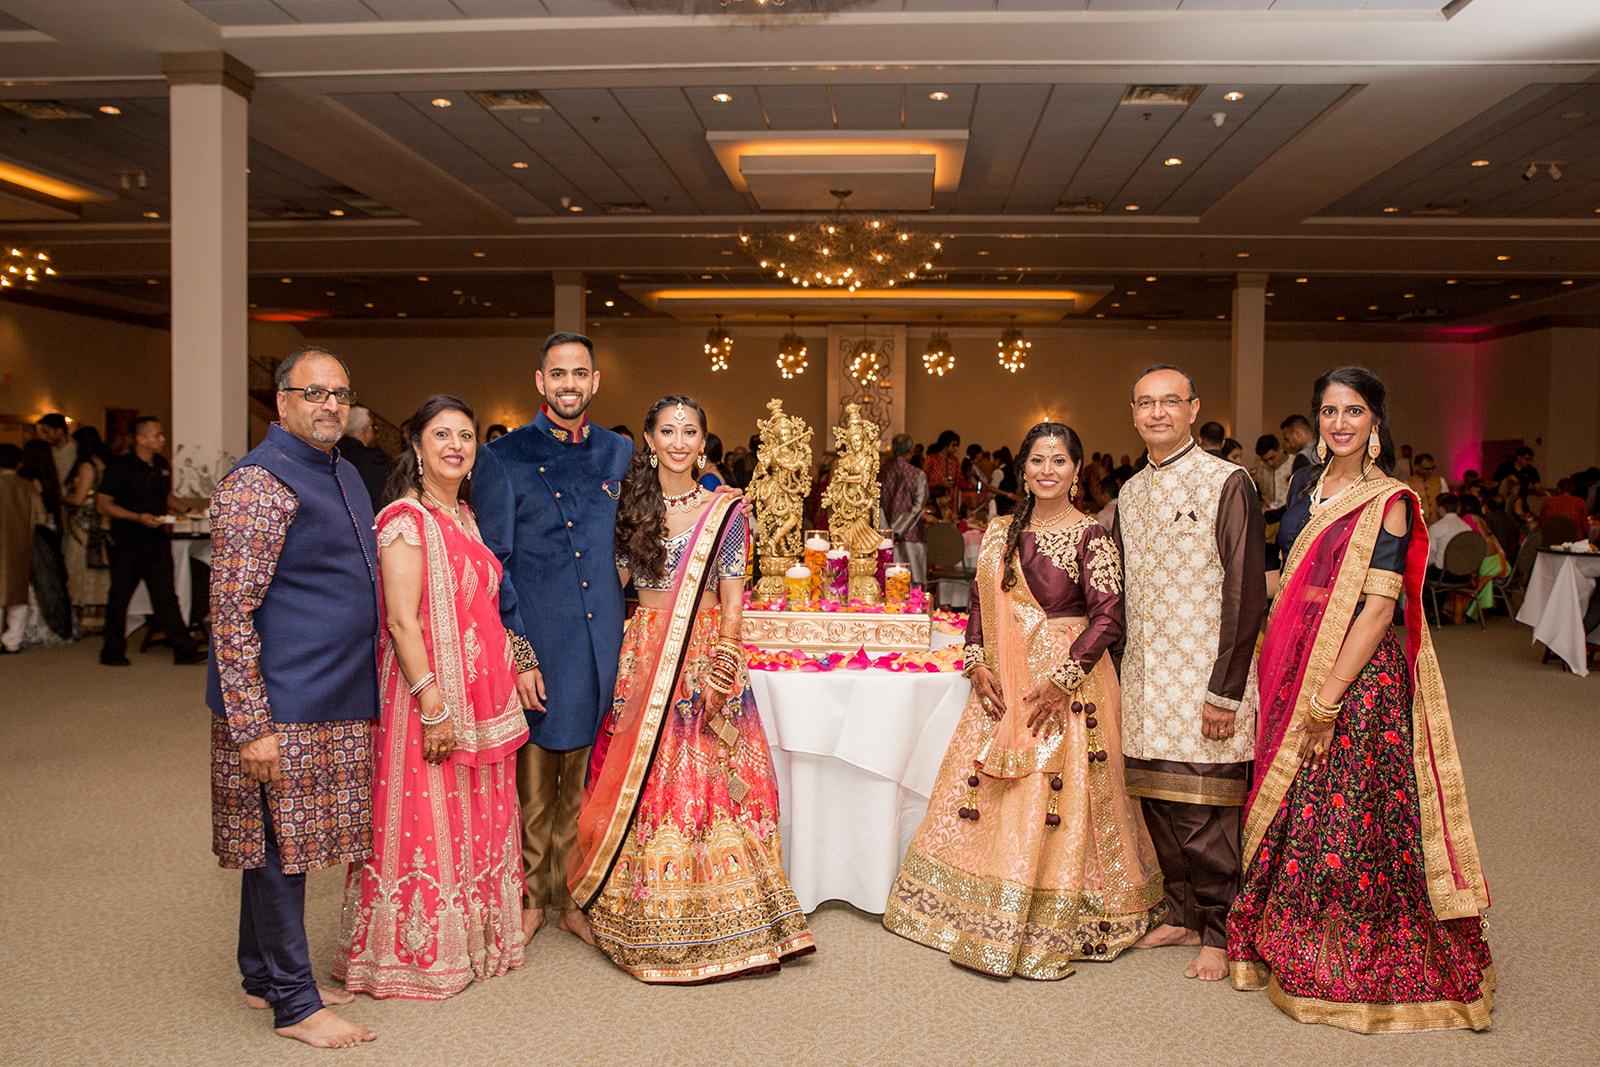 Le Cape Weddings - Puja and Kheelan - Garba A   -184.jpg